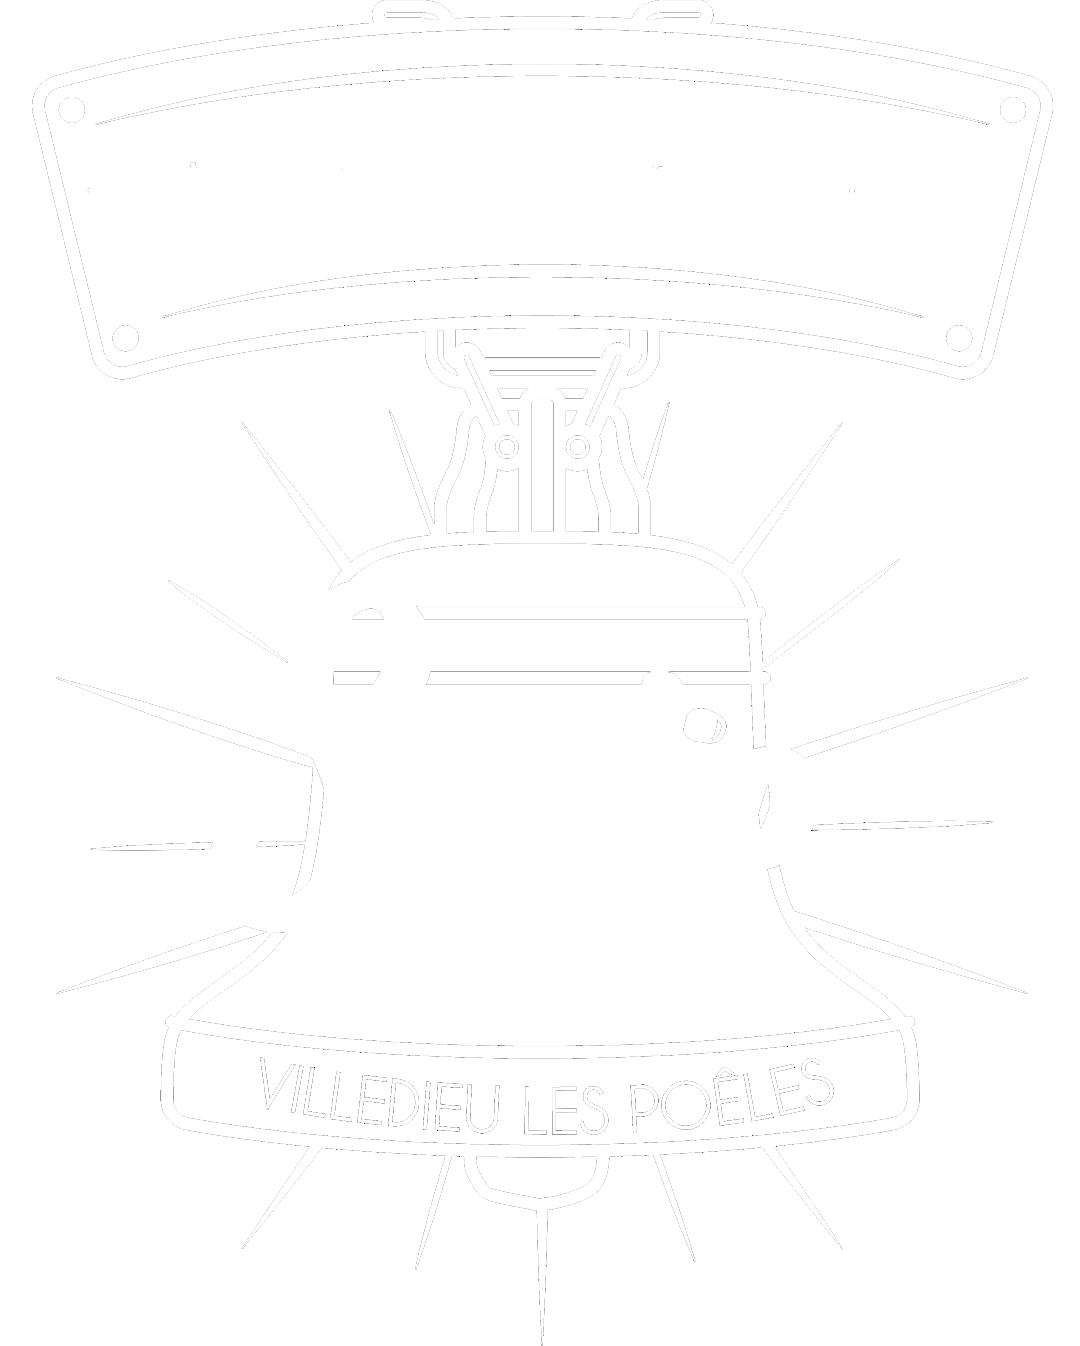 Choisir Son Gîte Logo Villedieu les poeles blanc